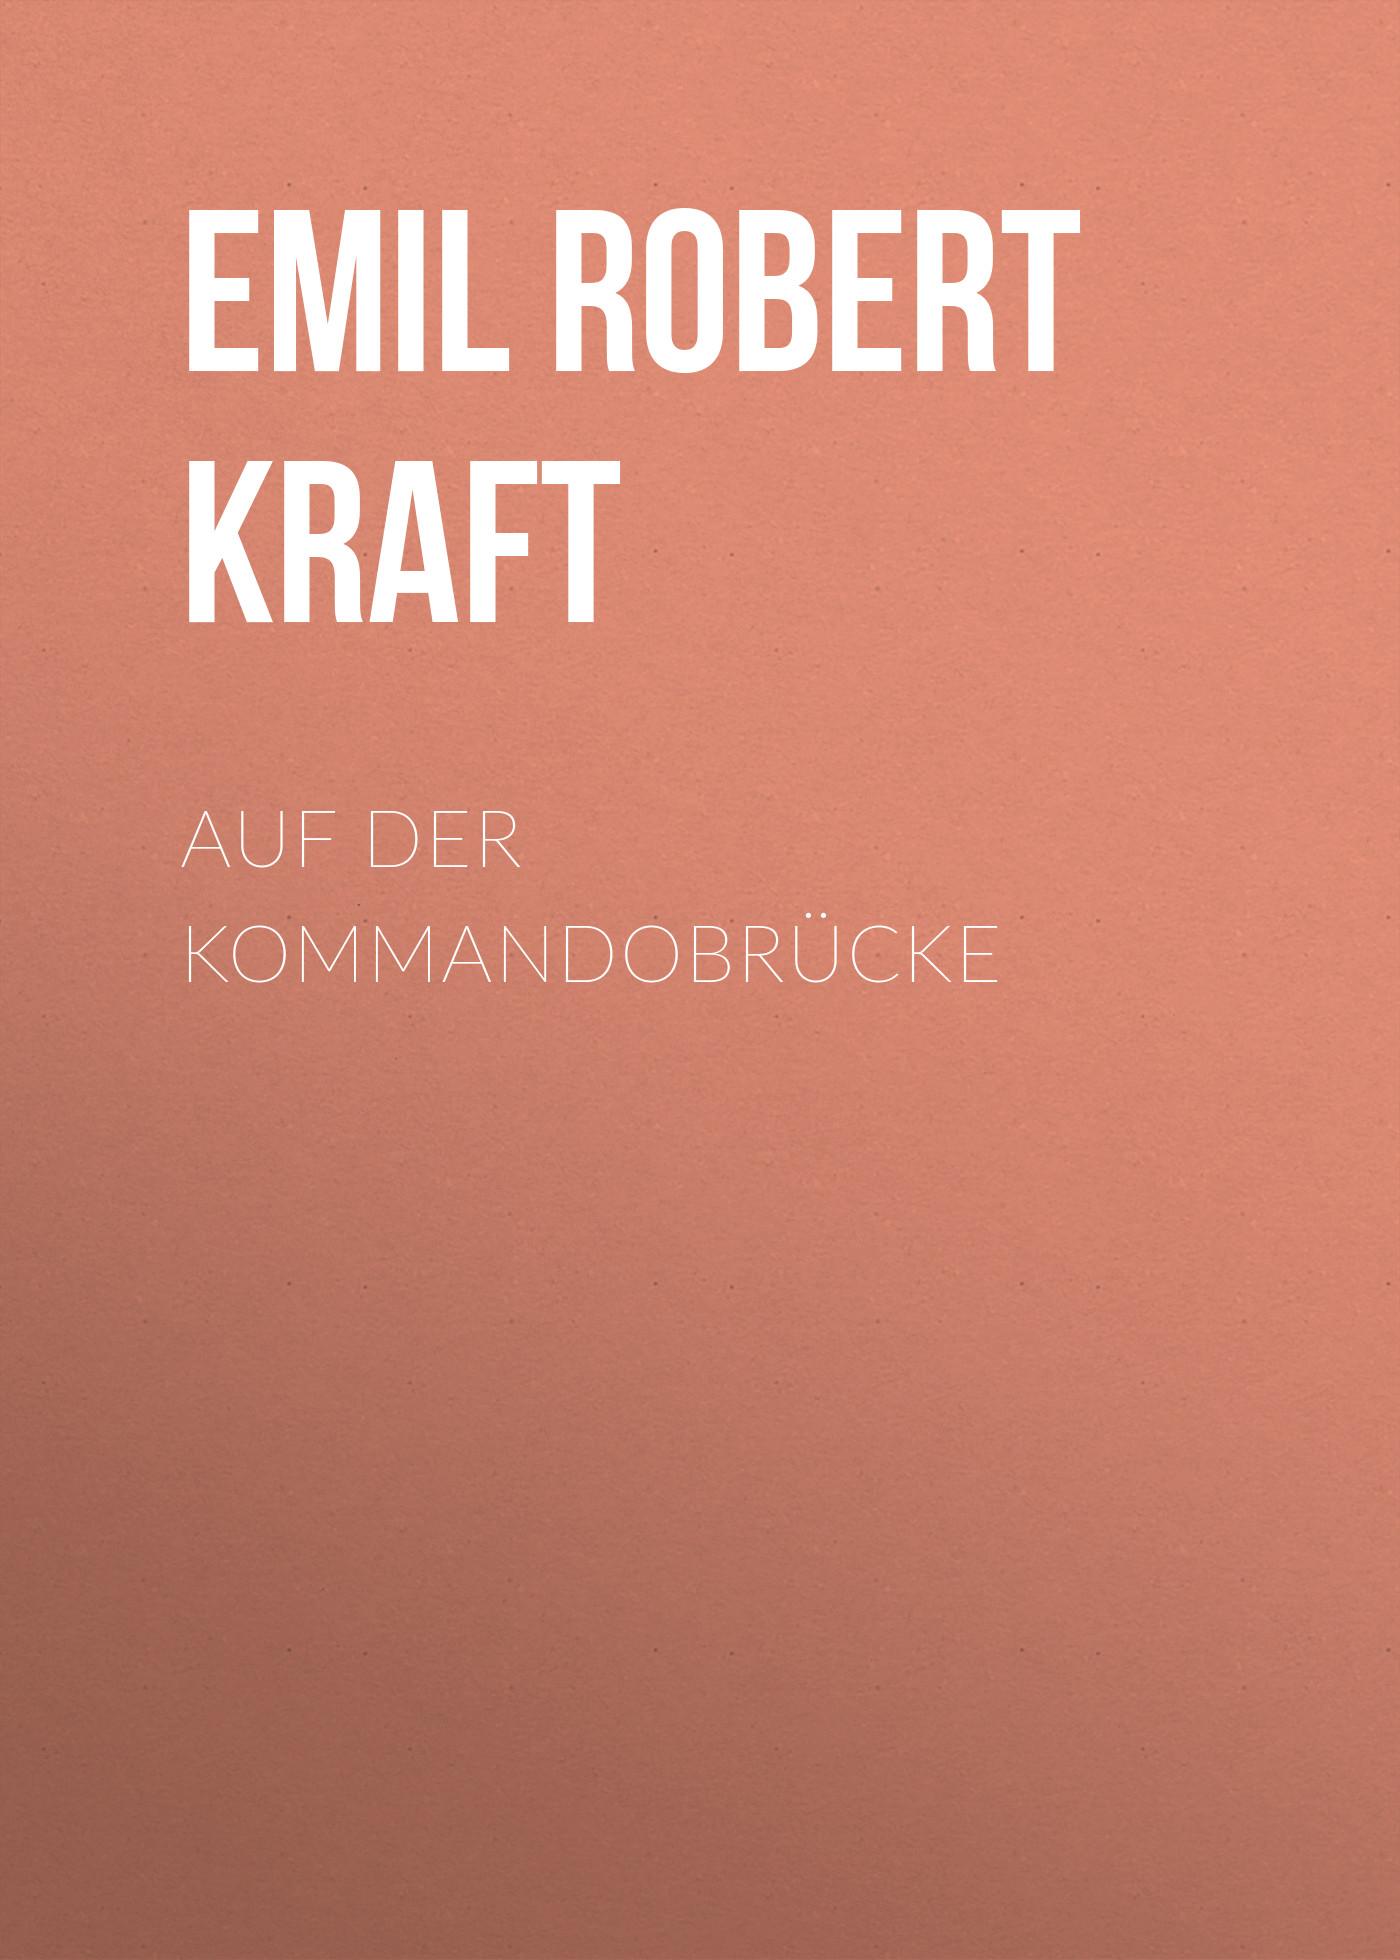 Emil Robert Kraft Auf der Kommandobrücke